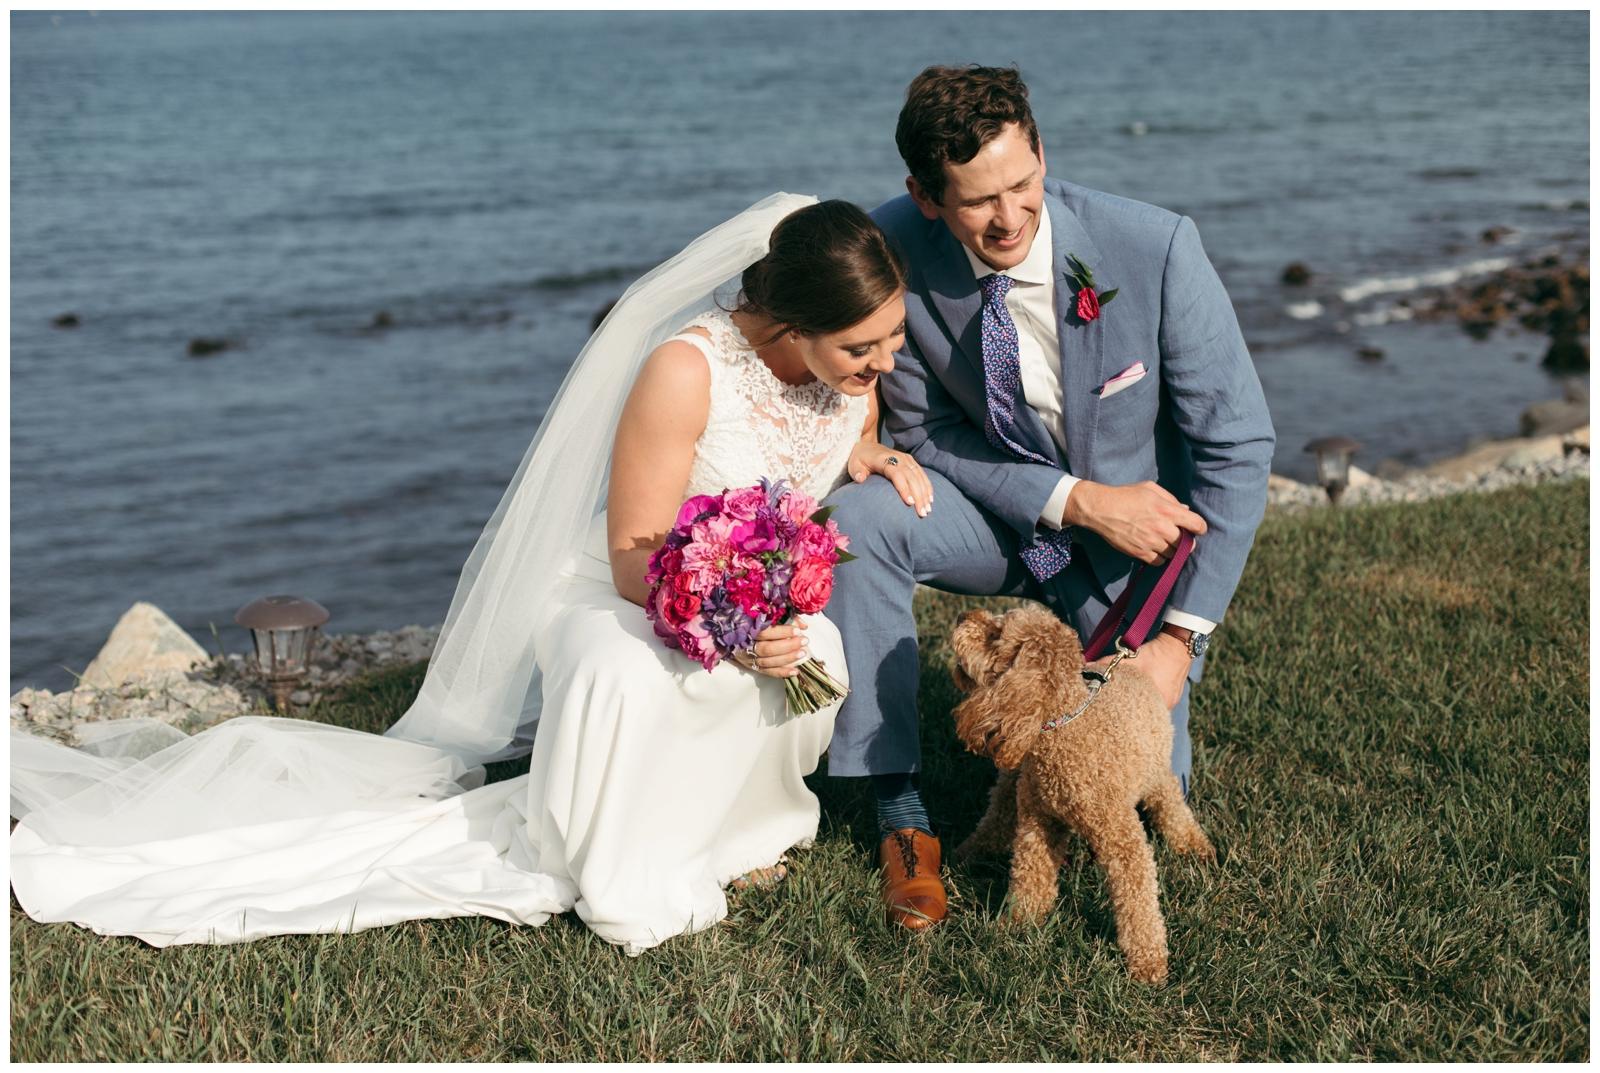 Bailey-Q-Photo-Backyard-Wedding-South-Shore-Boston-Wedding-Photographer-063.jpg